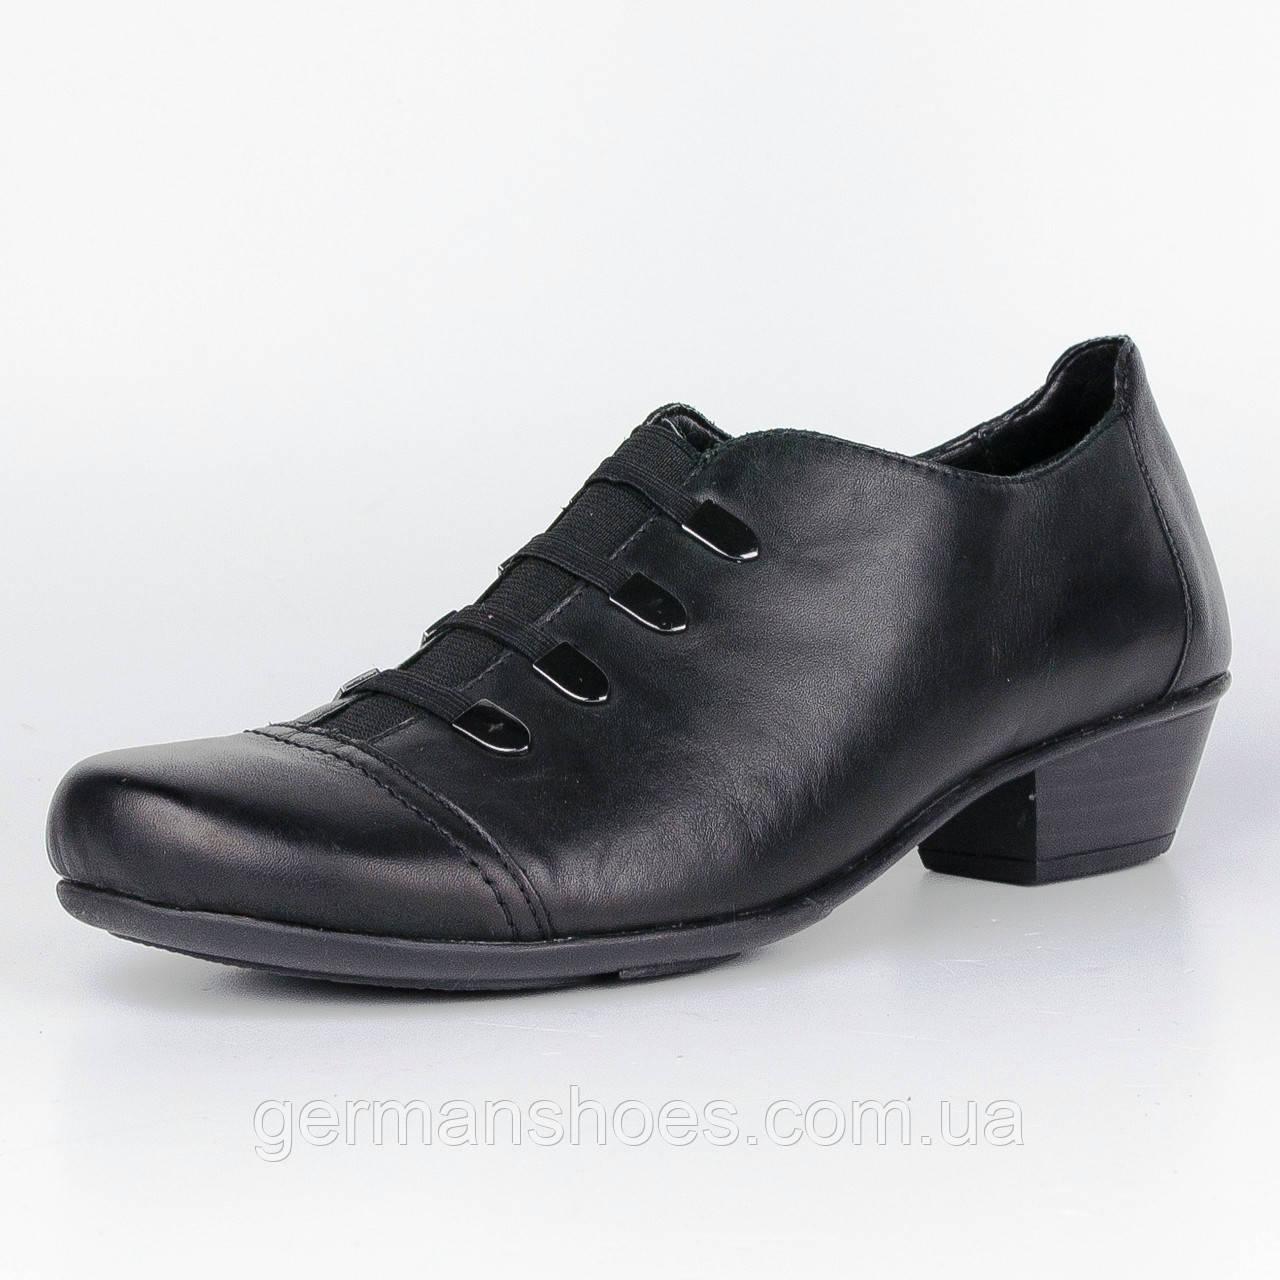 Туфли женские Remonte D7332-00